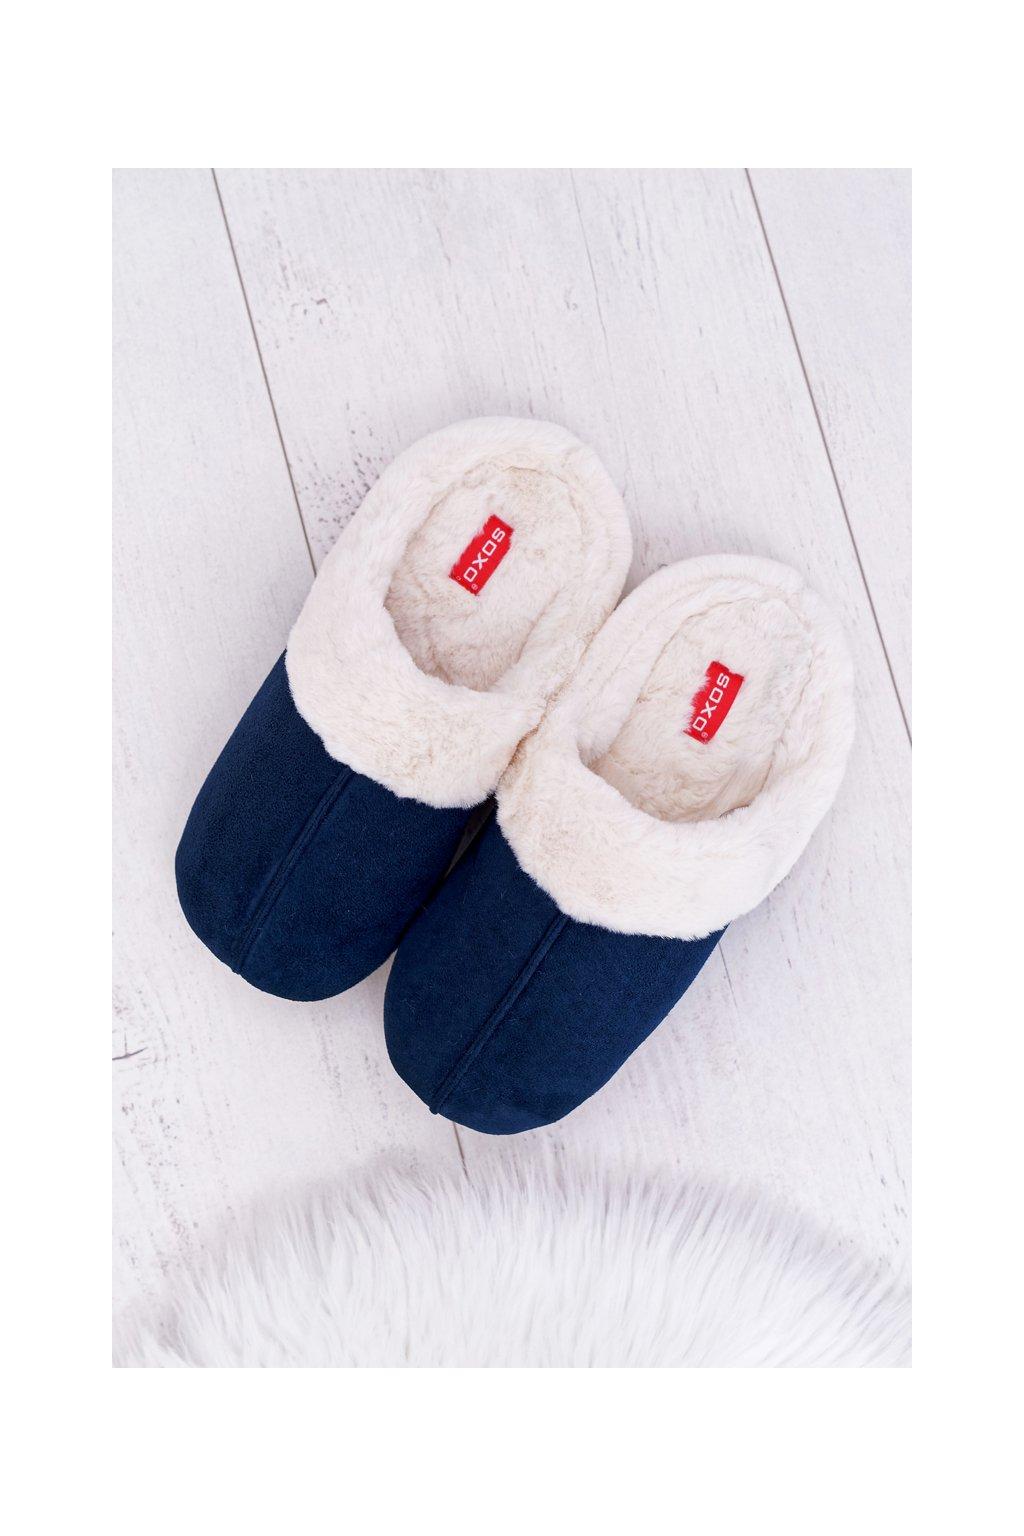 pánske Papuče SOXO s Koženou tmavo modré 70103